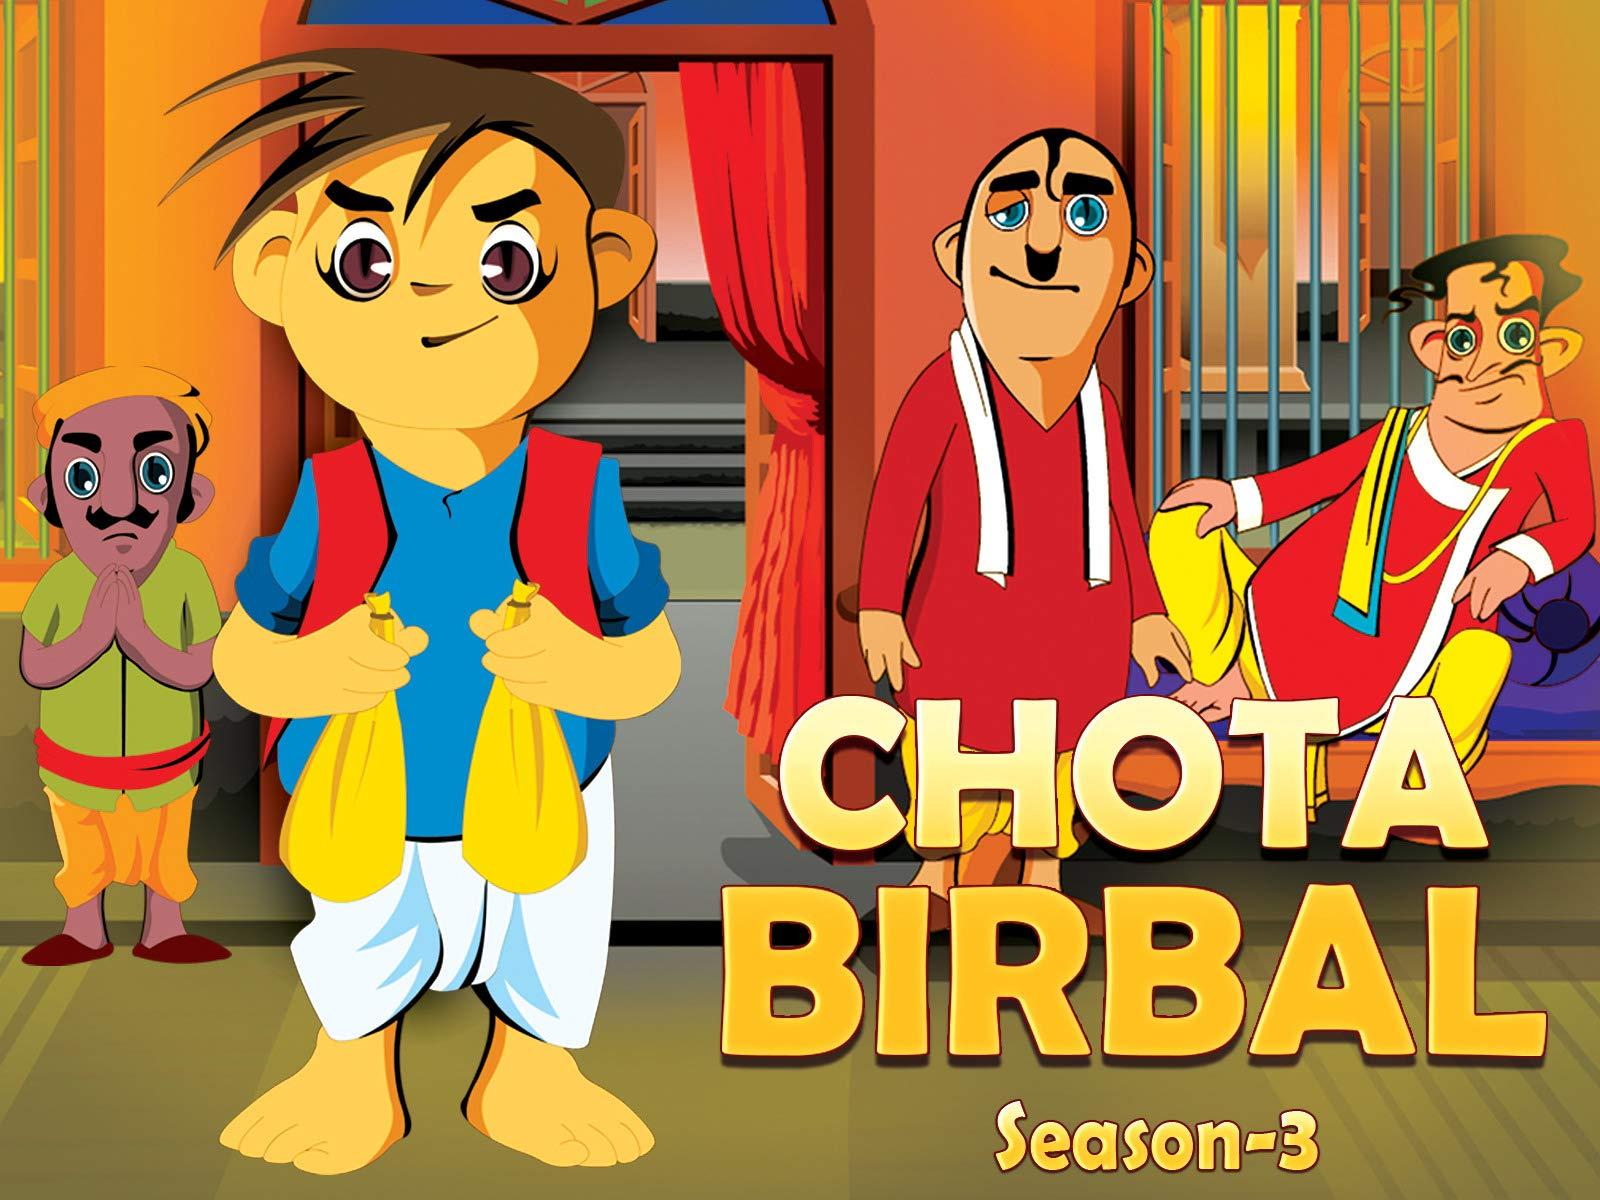 Chota Birbal - Season 3